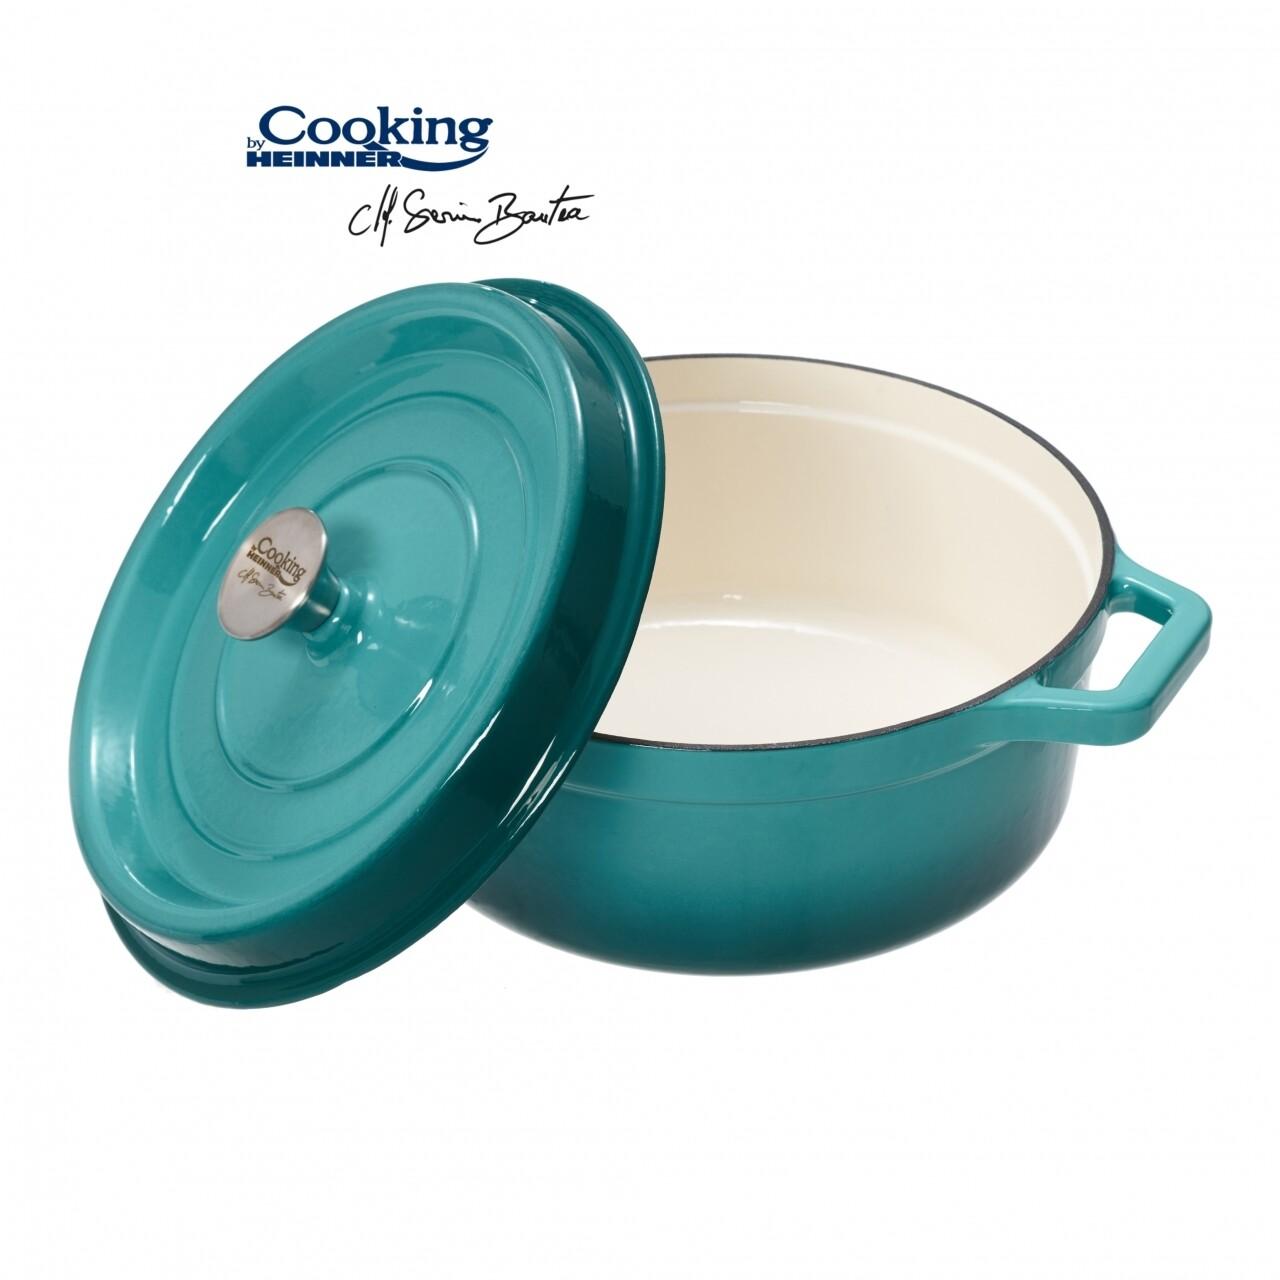 Cratita emailata, Cooking by Heinner, 4.4 l, fonta, bej si bleu